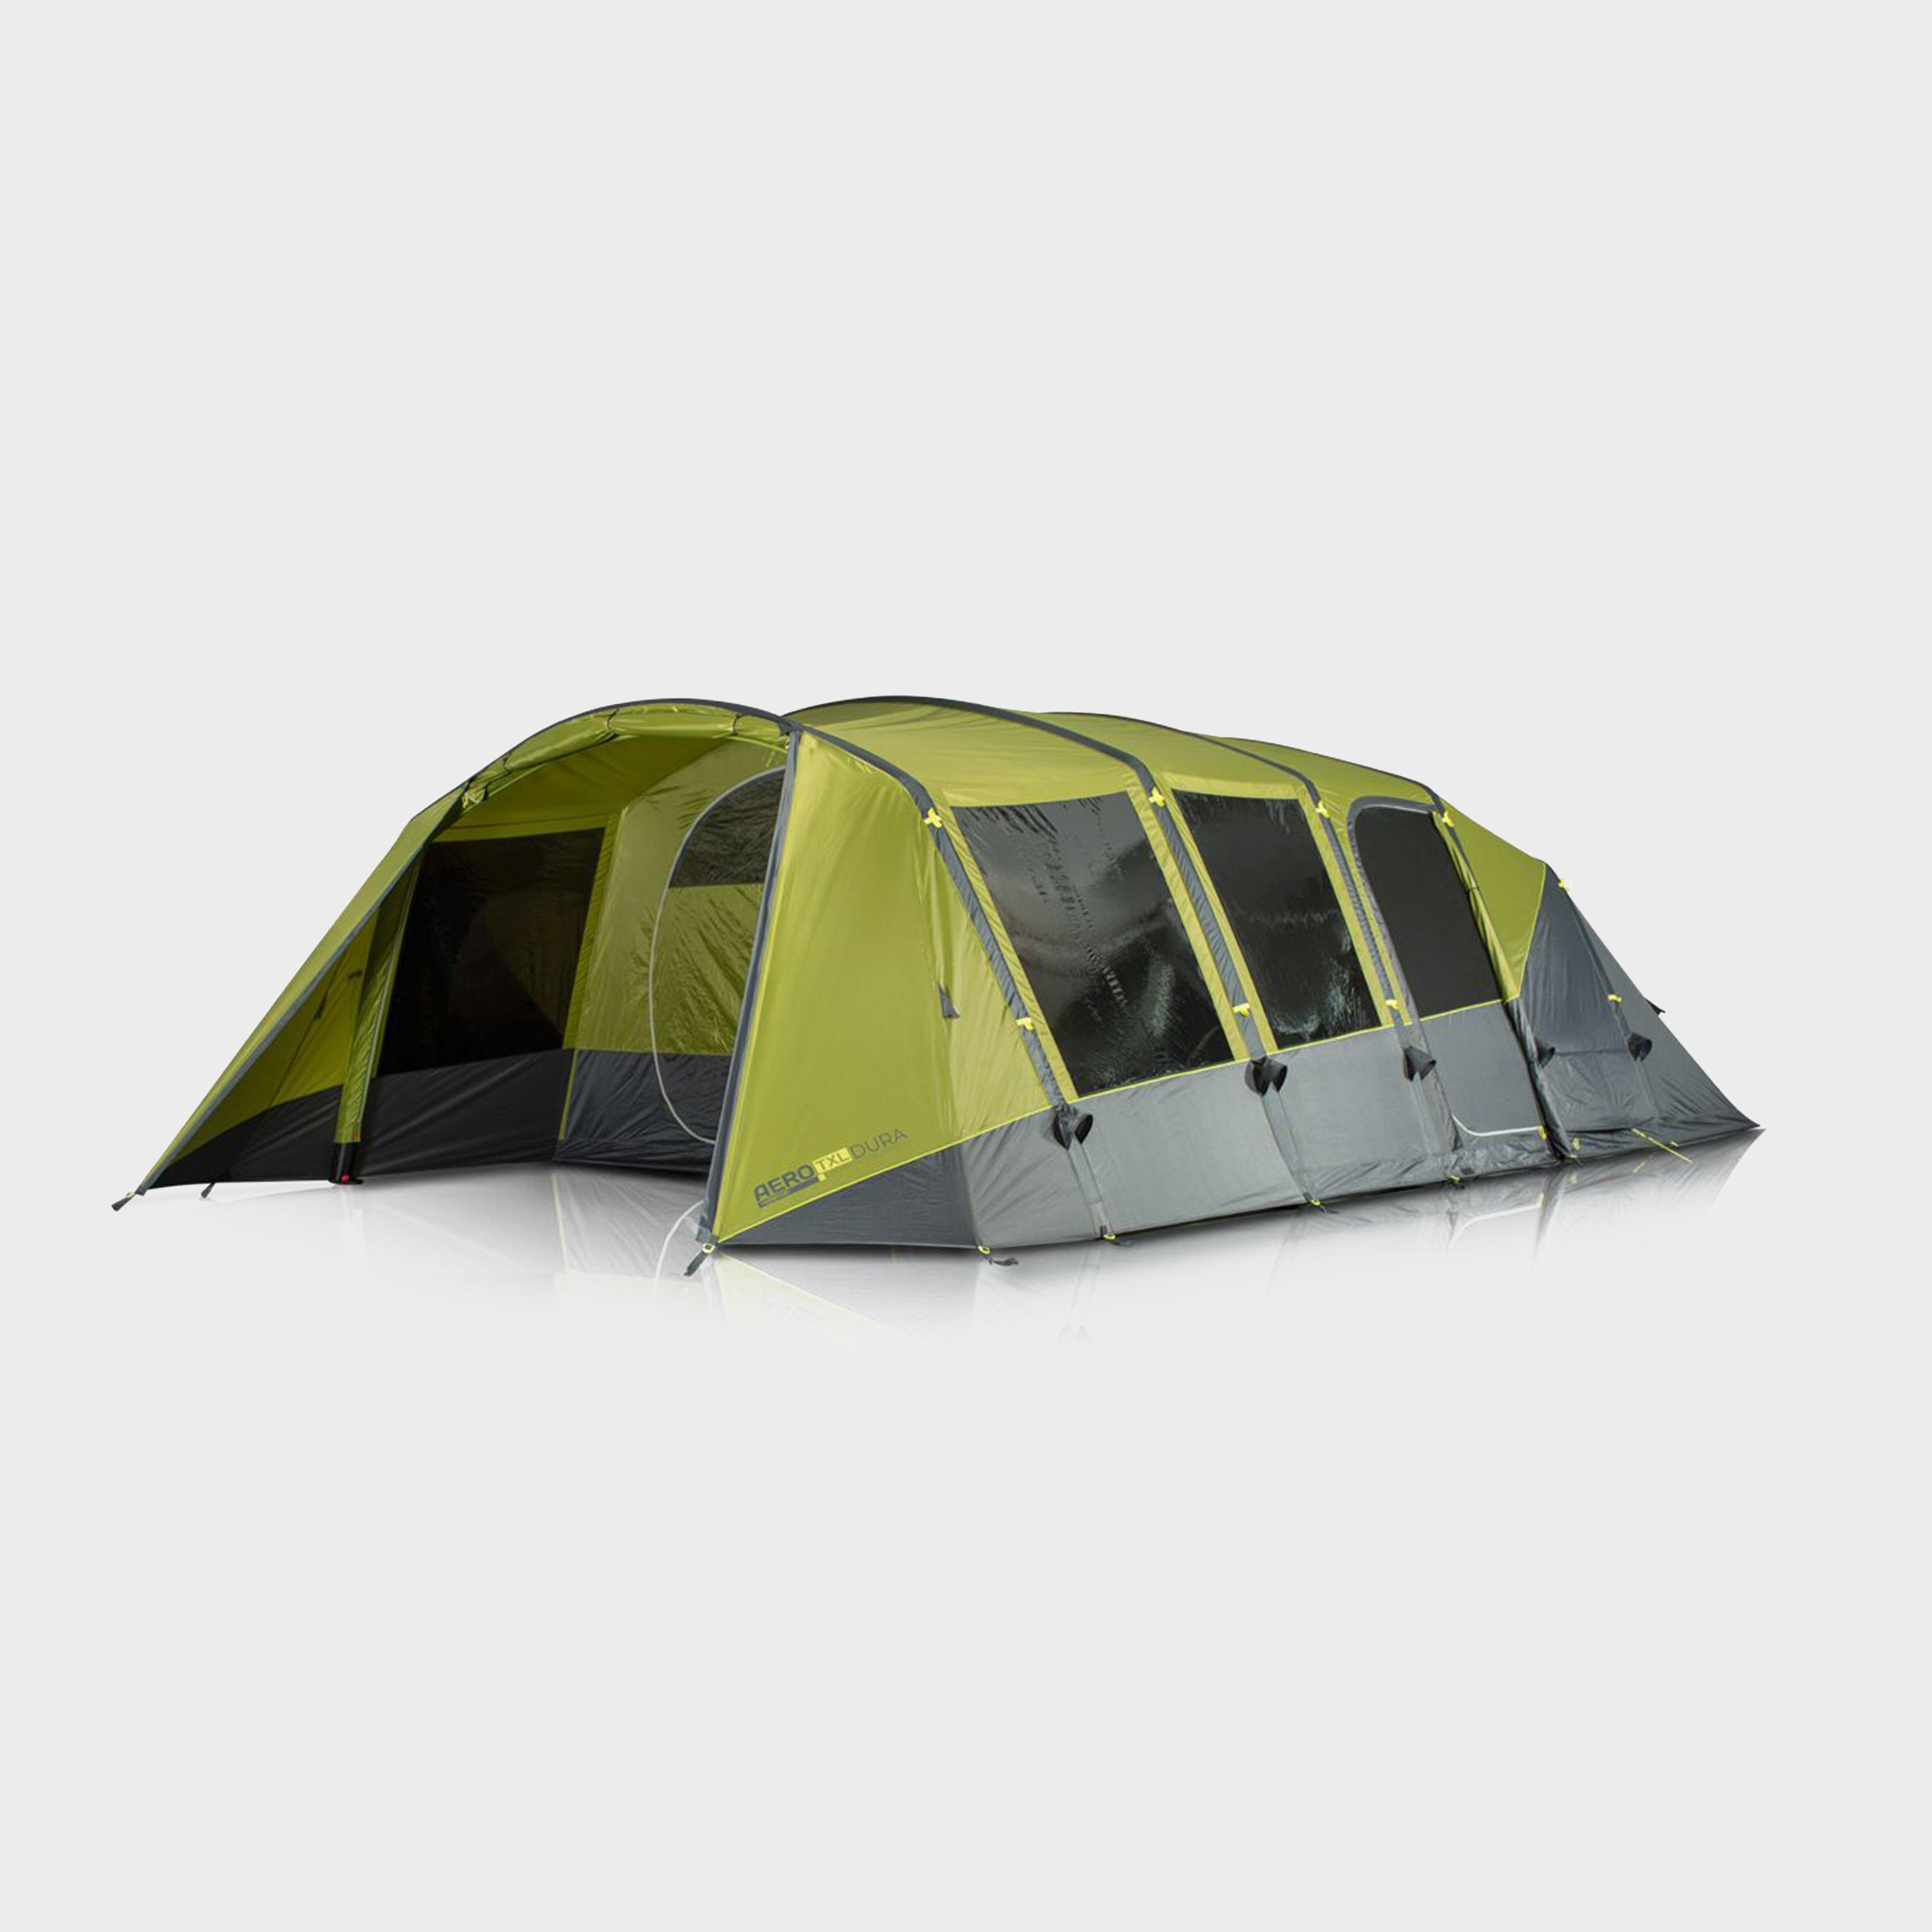 Zempire Aero Dura TXL Tent